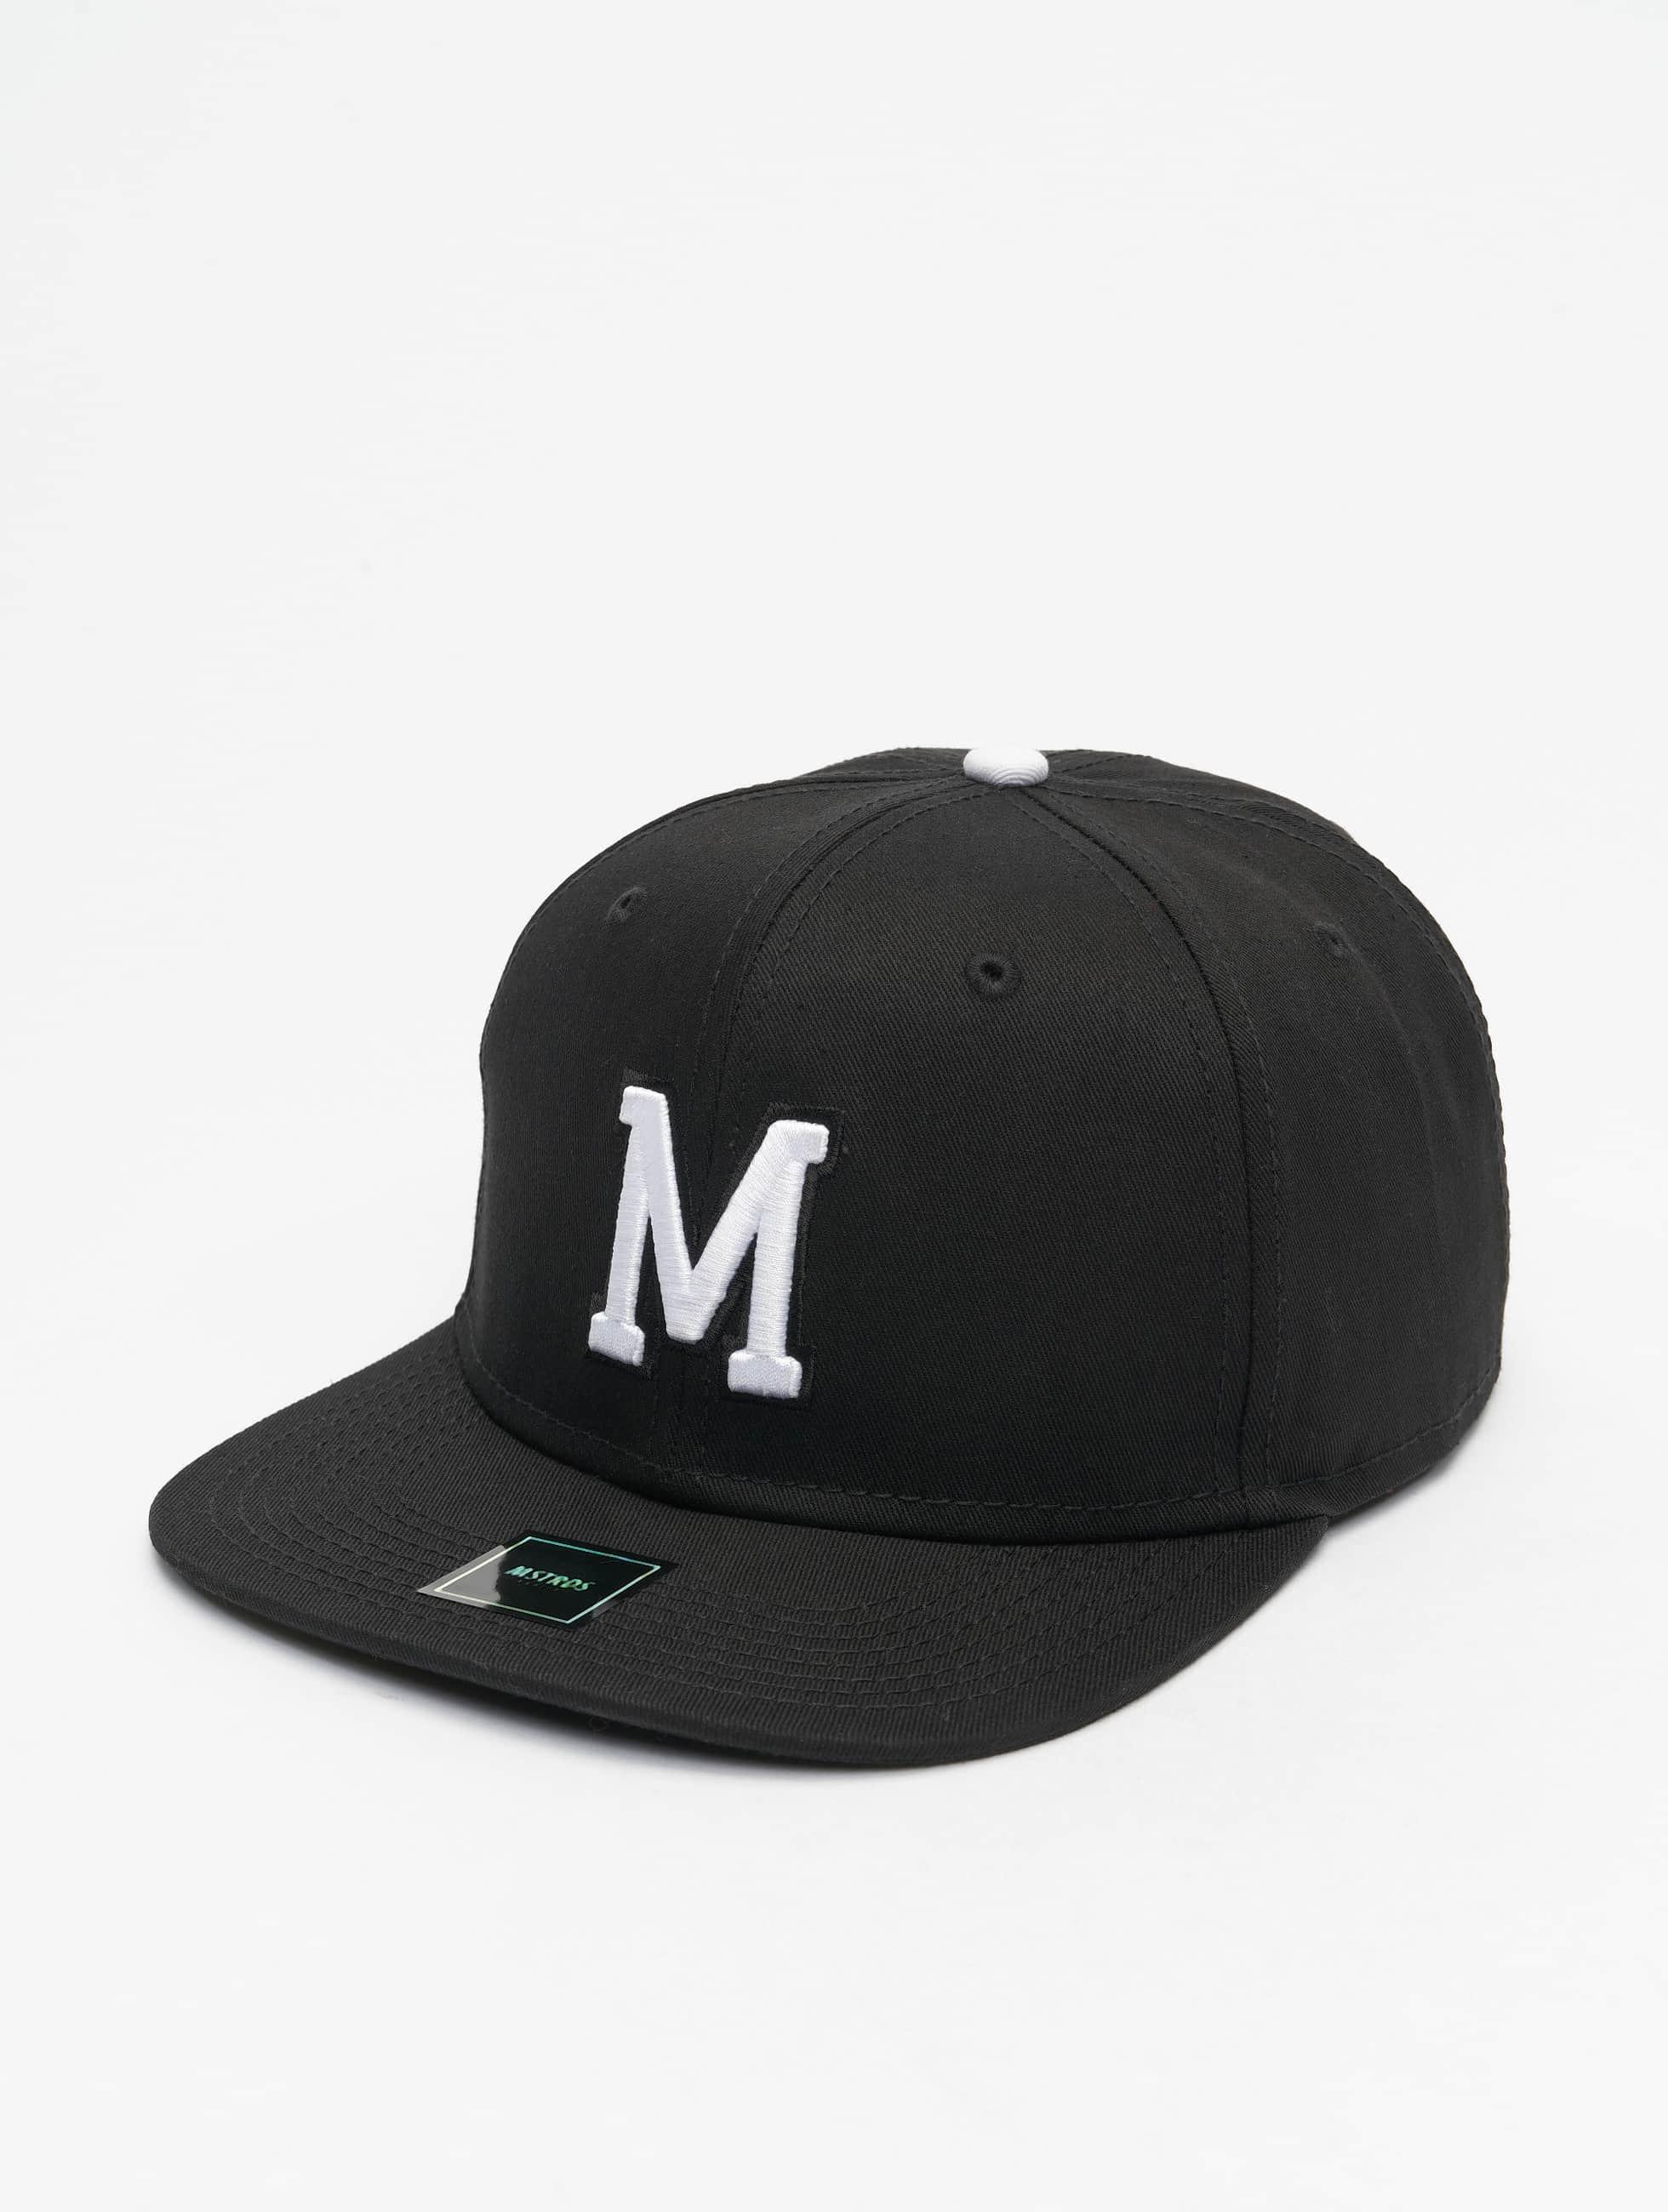 MSTRDS Casquette Snapback & Strapback M Letter noir